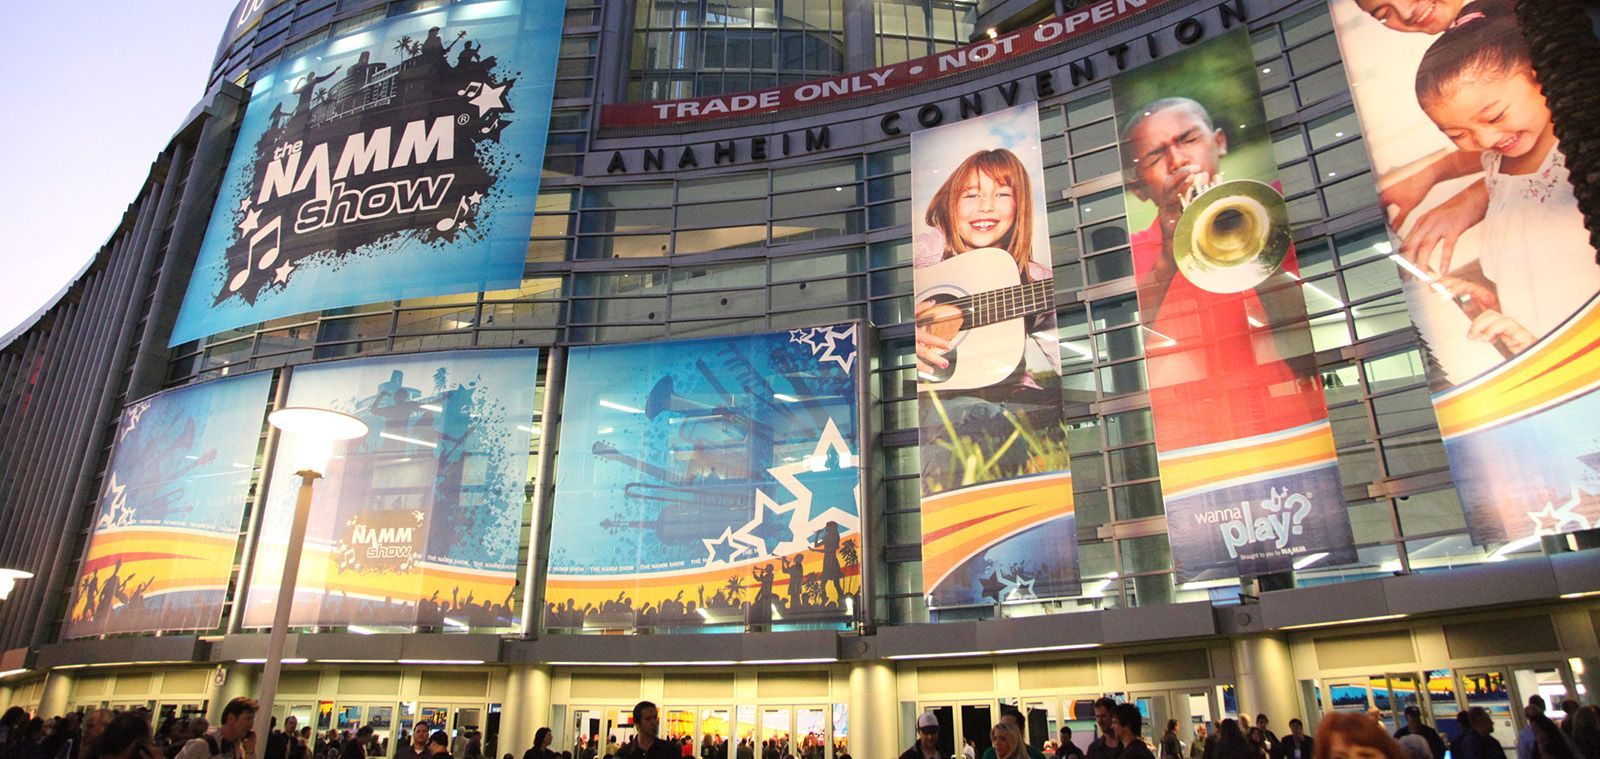 Trey The Namm Show 2015 Namm Show Music Anaheim